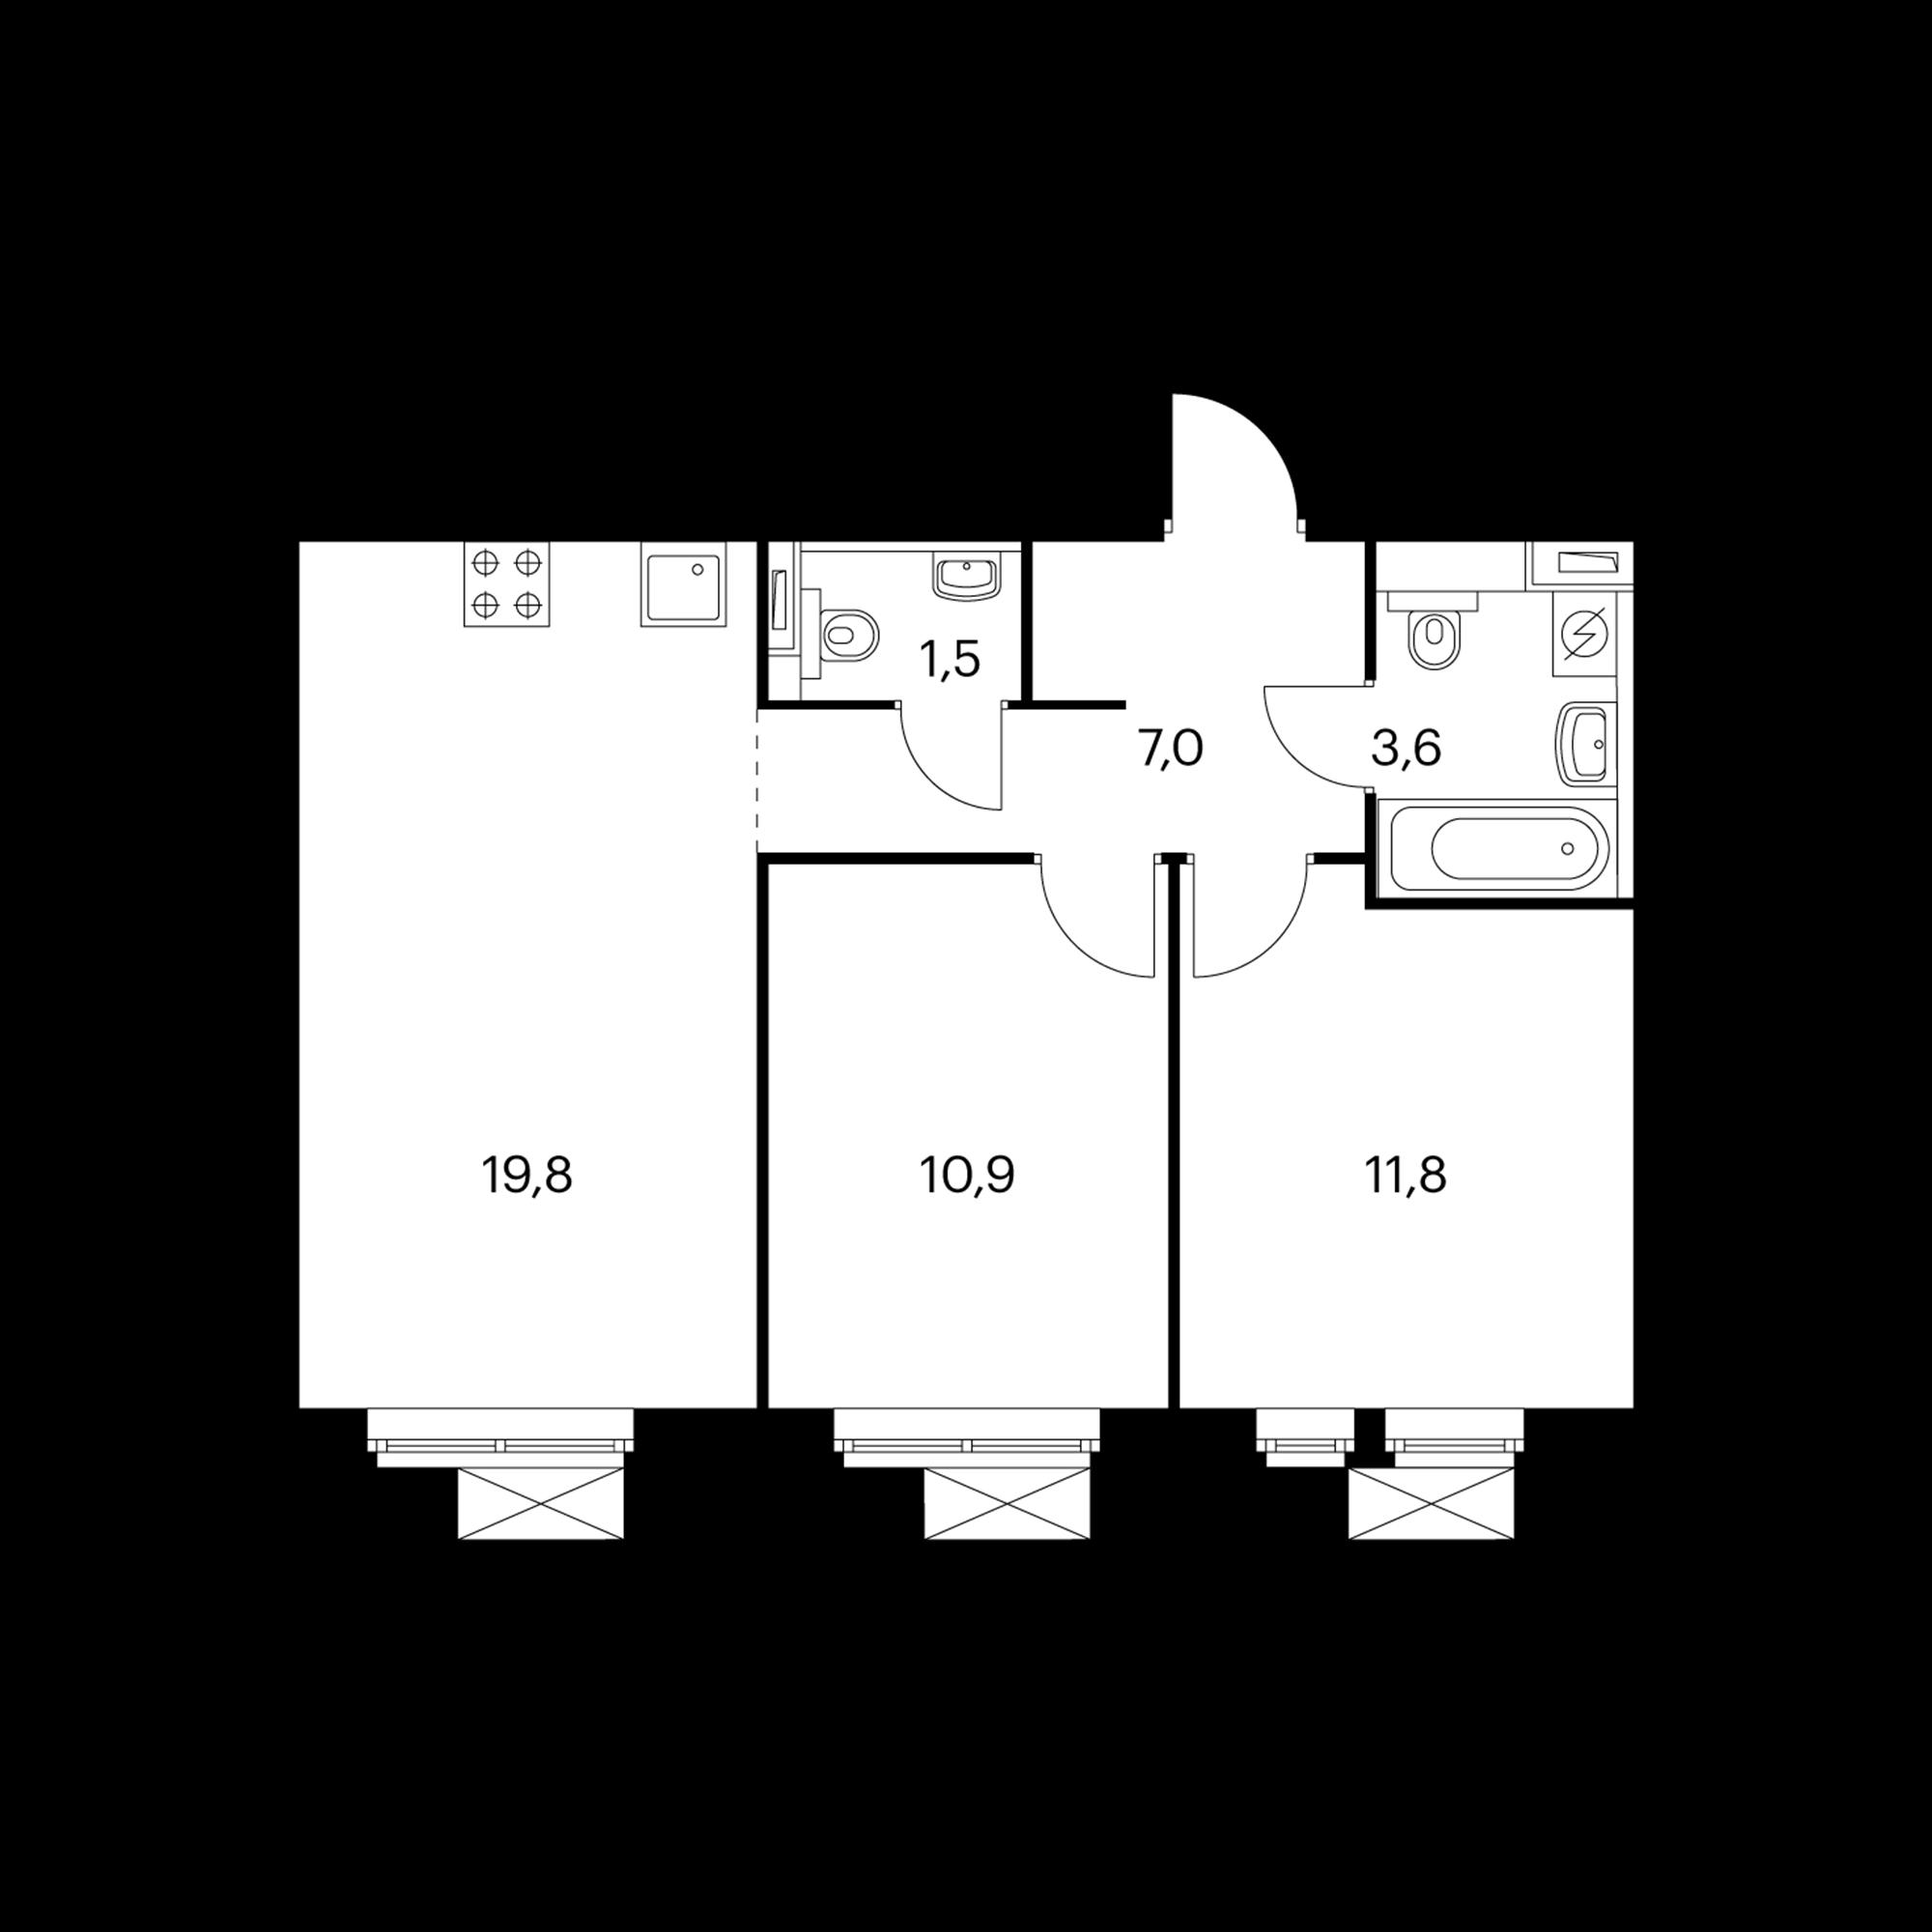 2ES8_9.6-1_S_Z